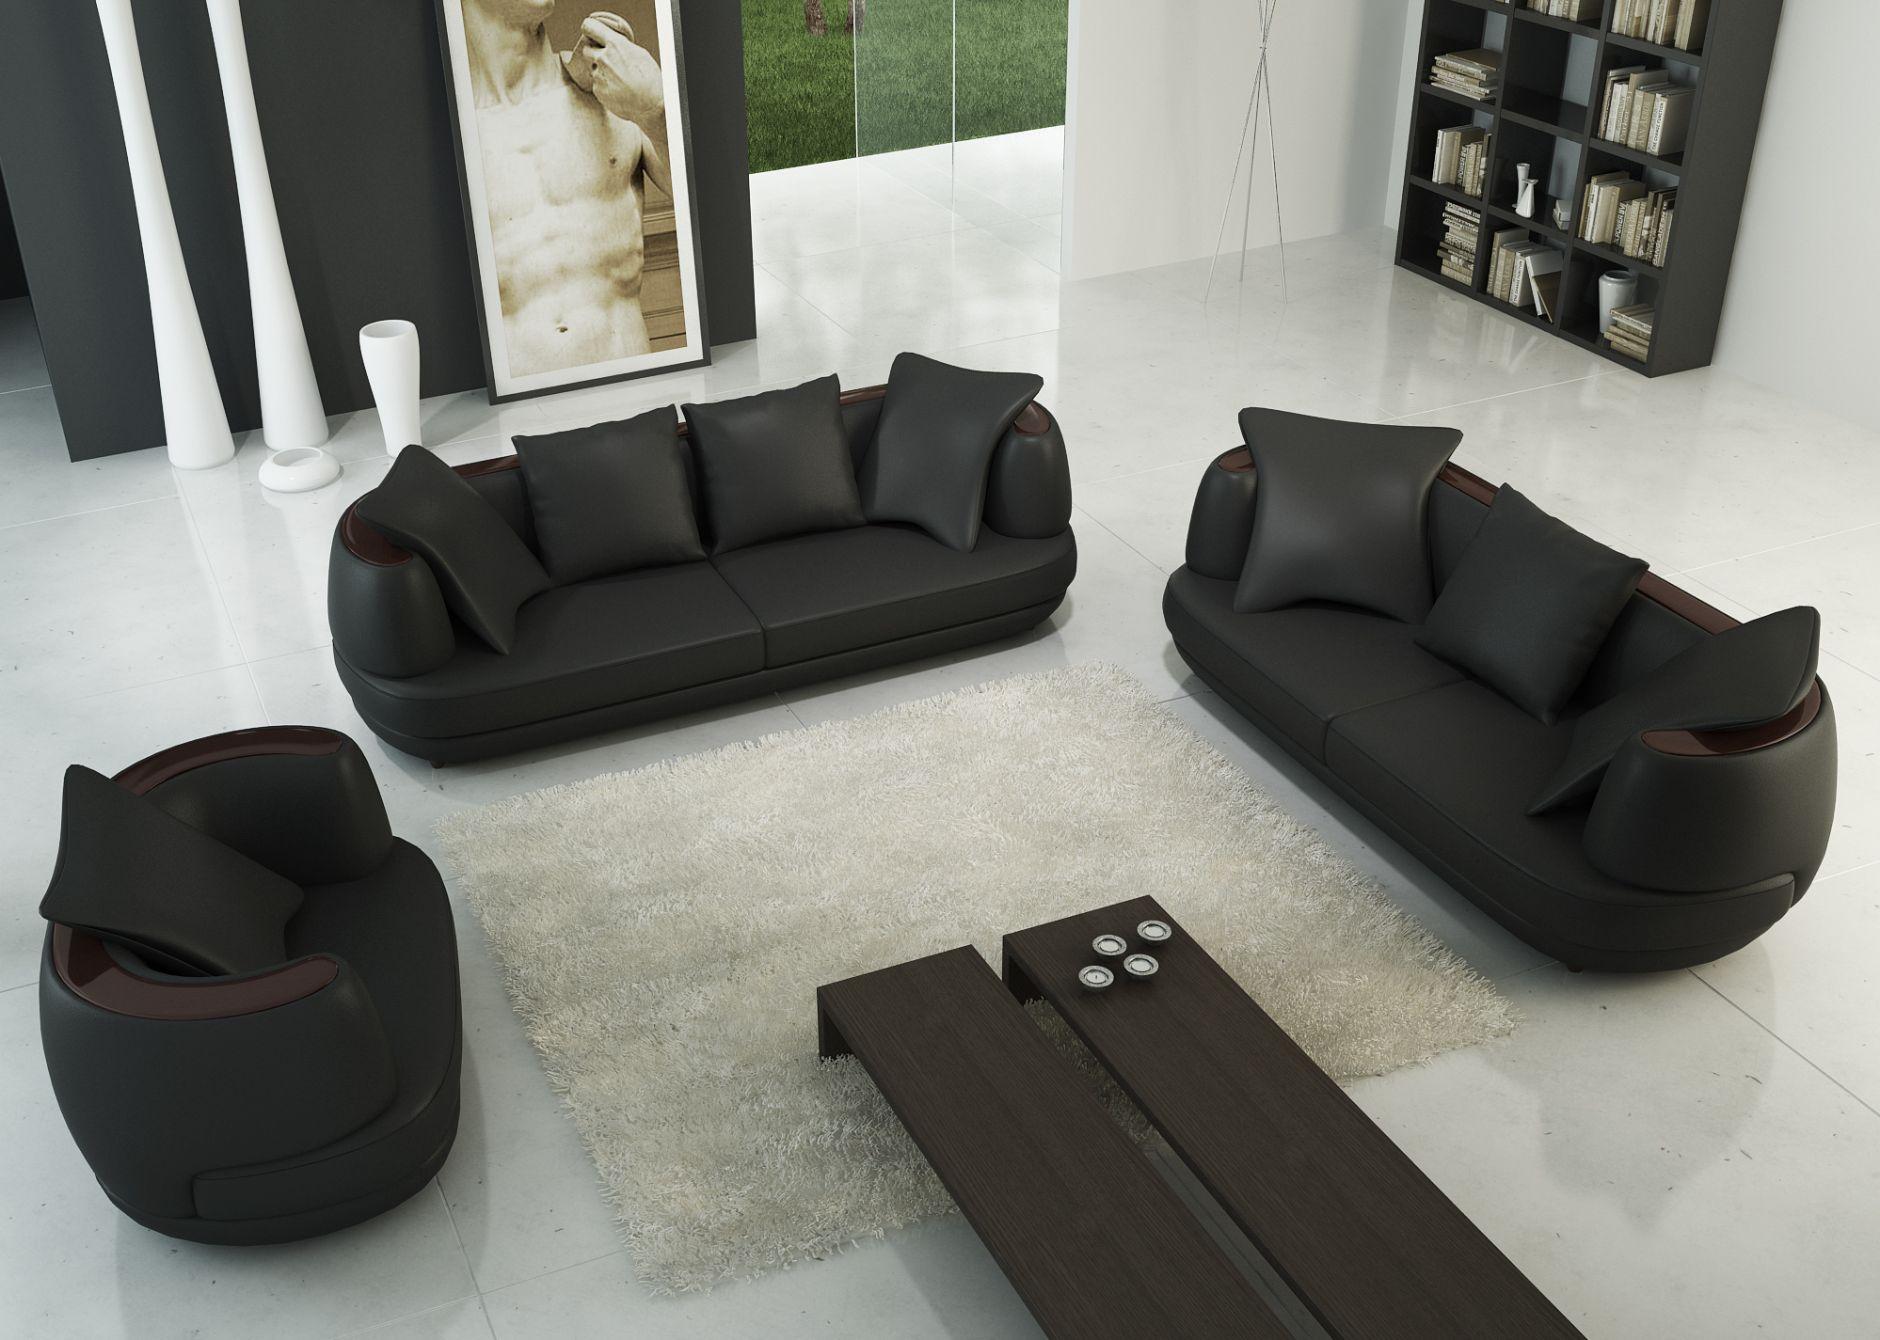 Muebles Tapizados Modelo De Muebles Tapizados 106muebles De Italia # Muebles Tapizados En Tela